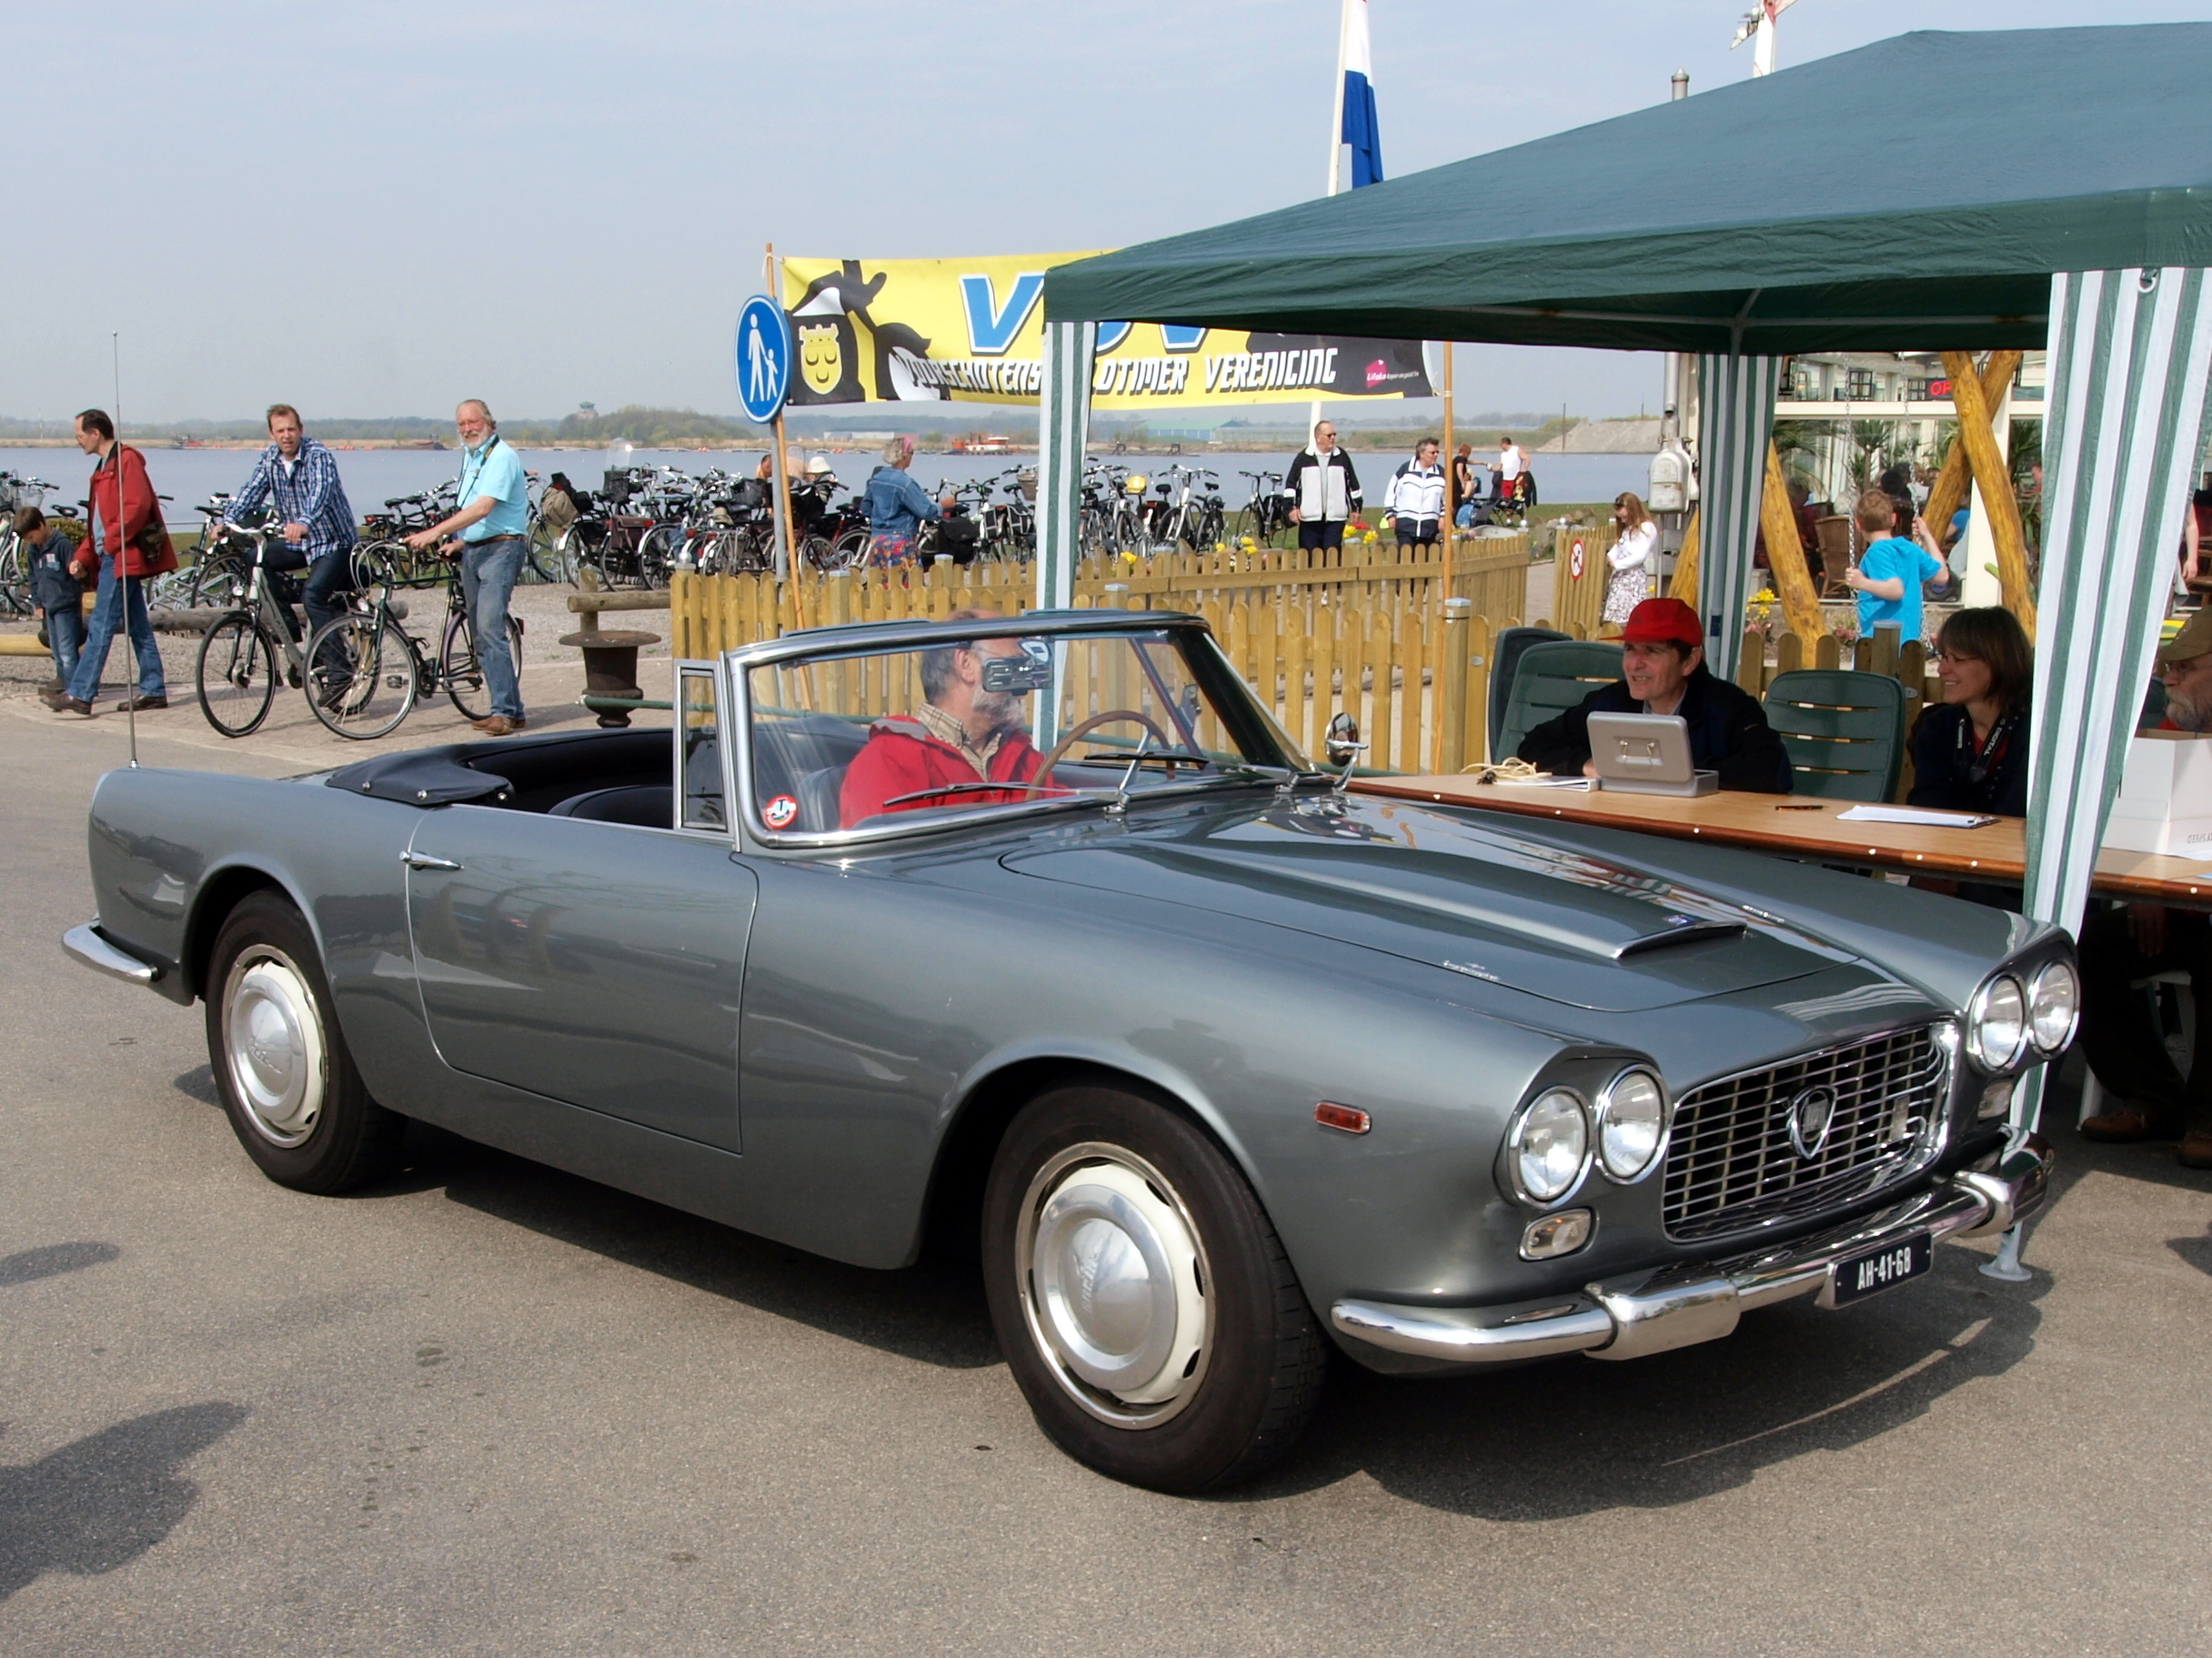 https://upload.wikimedia.org/wikipedia/commons/1/1d/Lancia_Flaminia_G.T_3C_2.8_%281968%29%2C_Dutch_licence_registration_AH-41-68_pic4.JPG